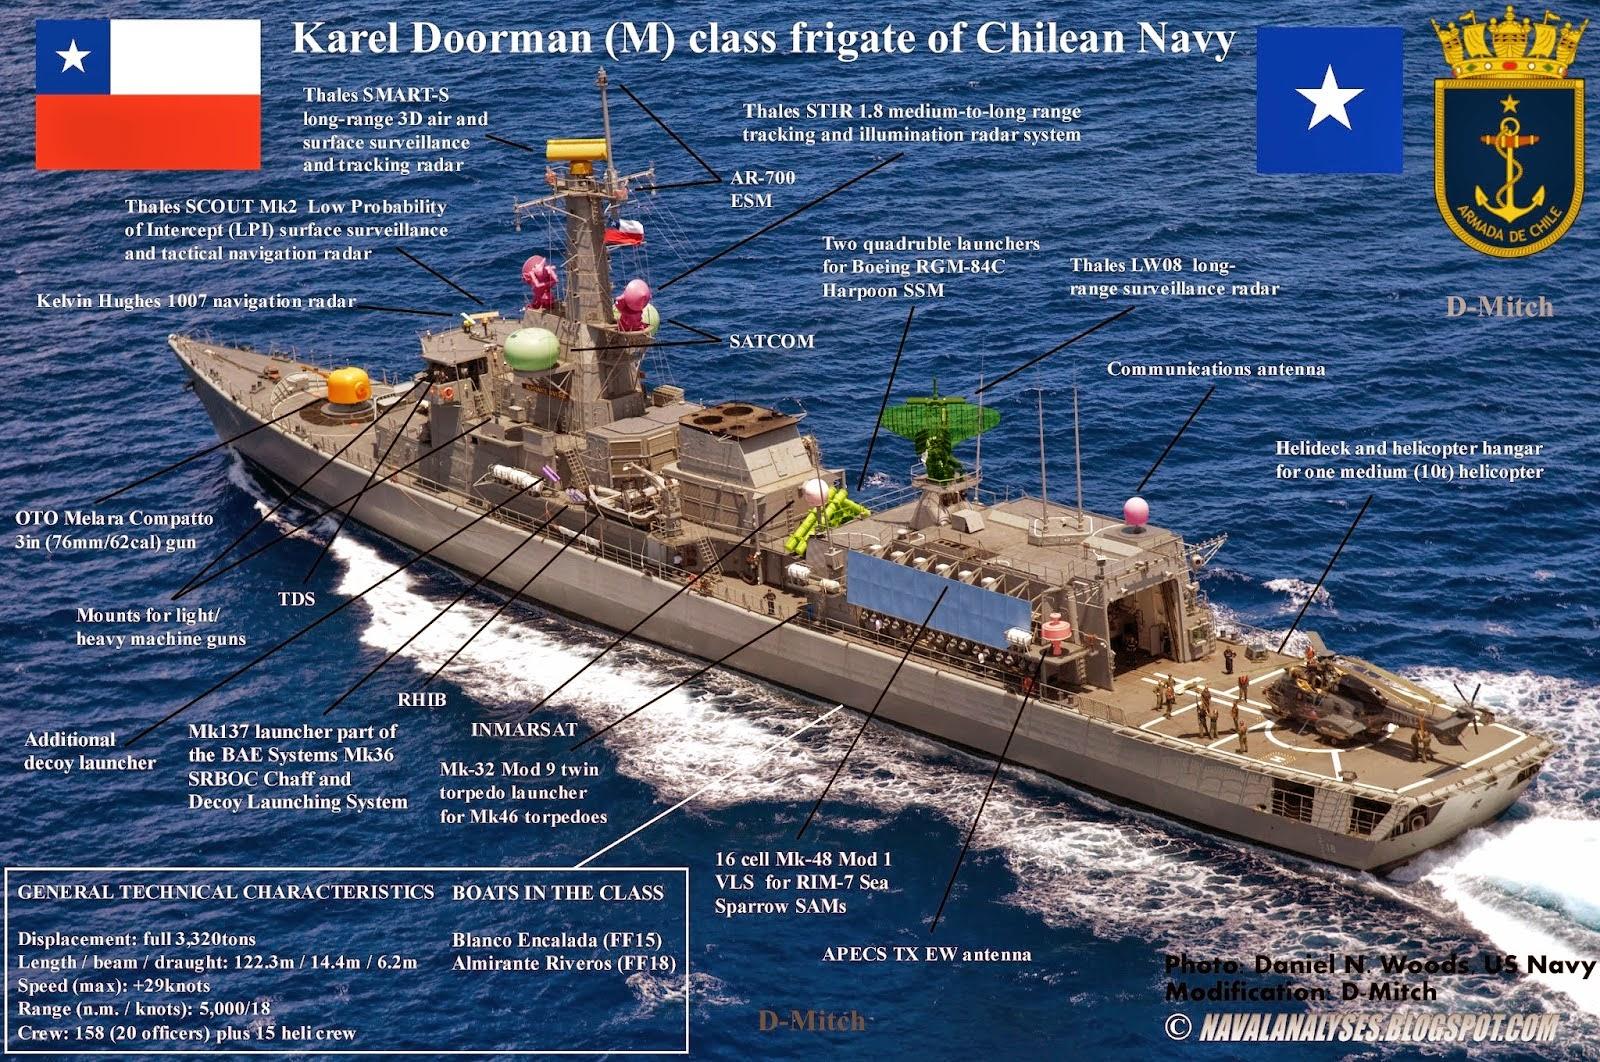 http://navalanalyses.blogspot.com/2014/11/karel-doorman-m-class-frigates-of.html